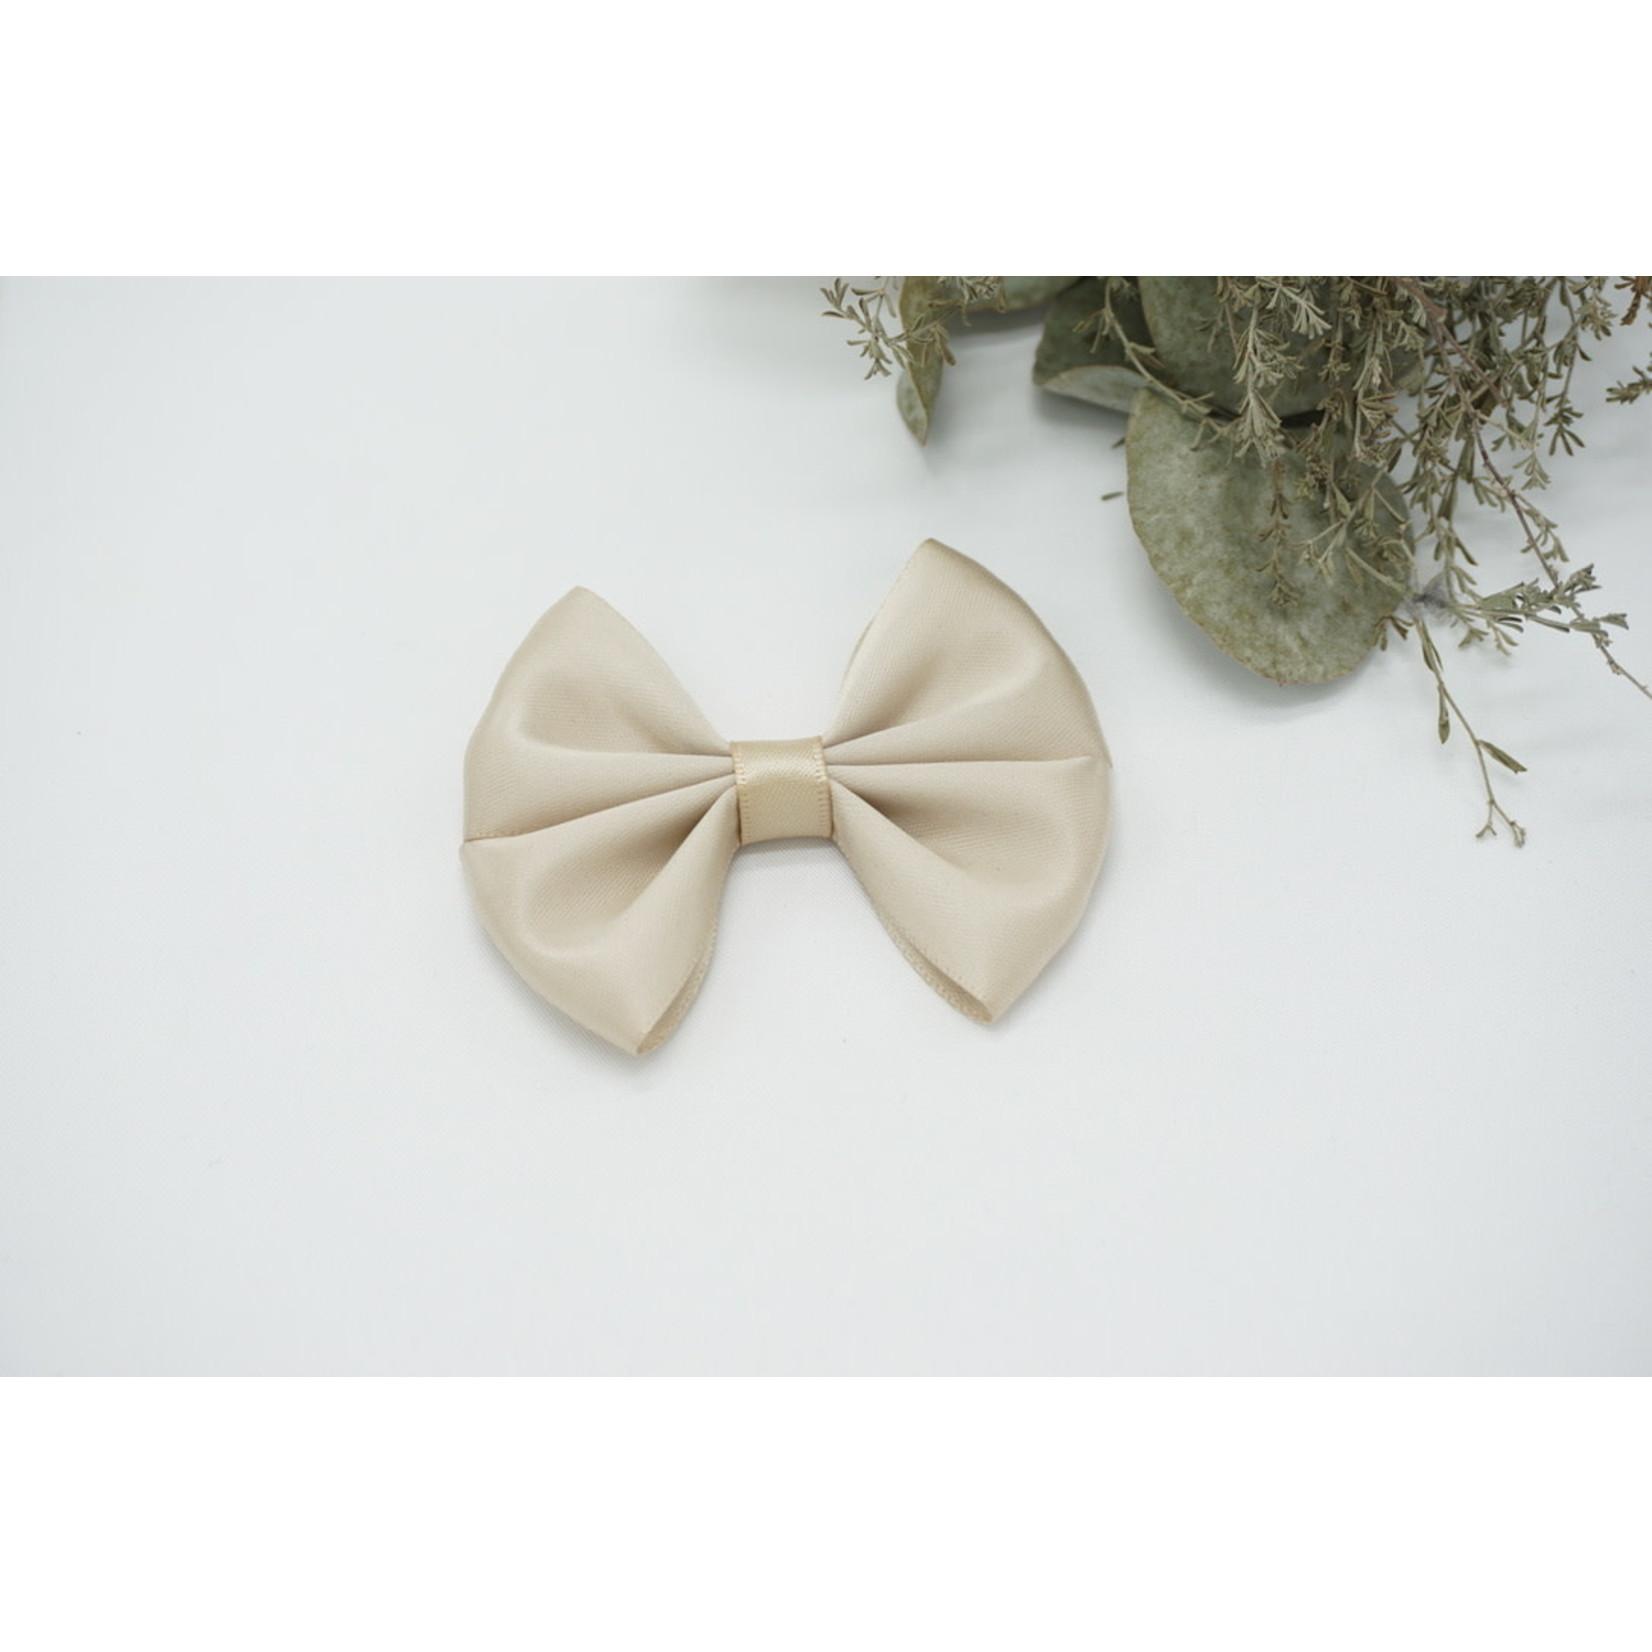 Petite Zara Satin Bow - Sand